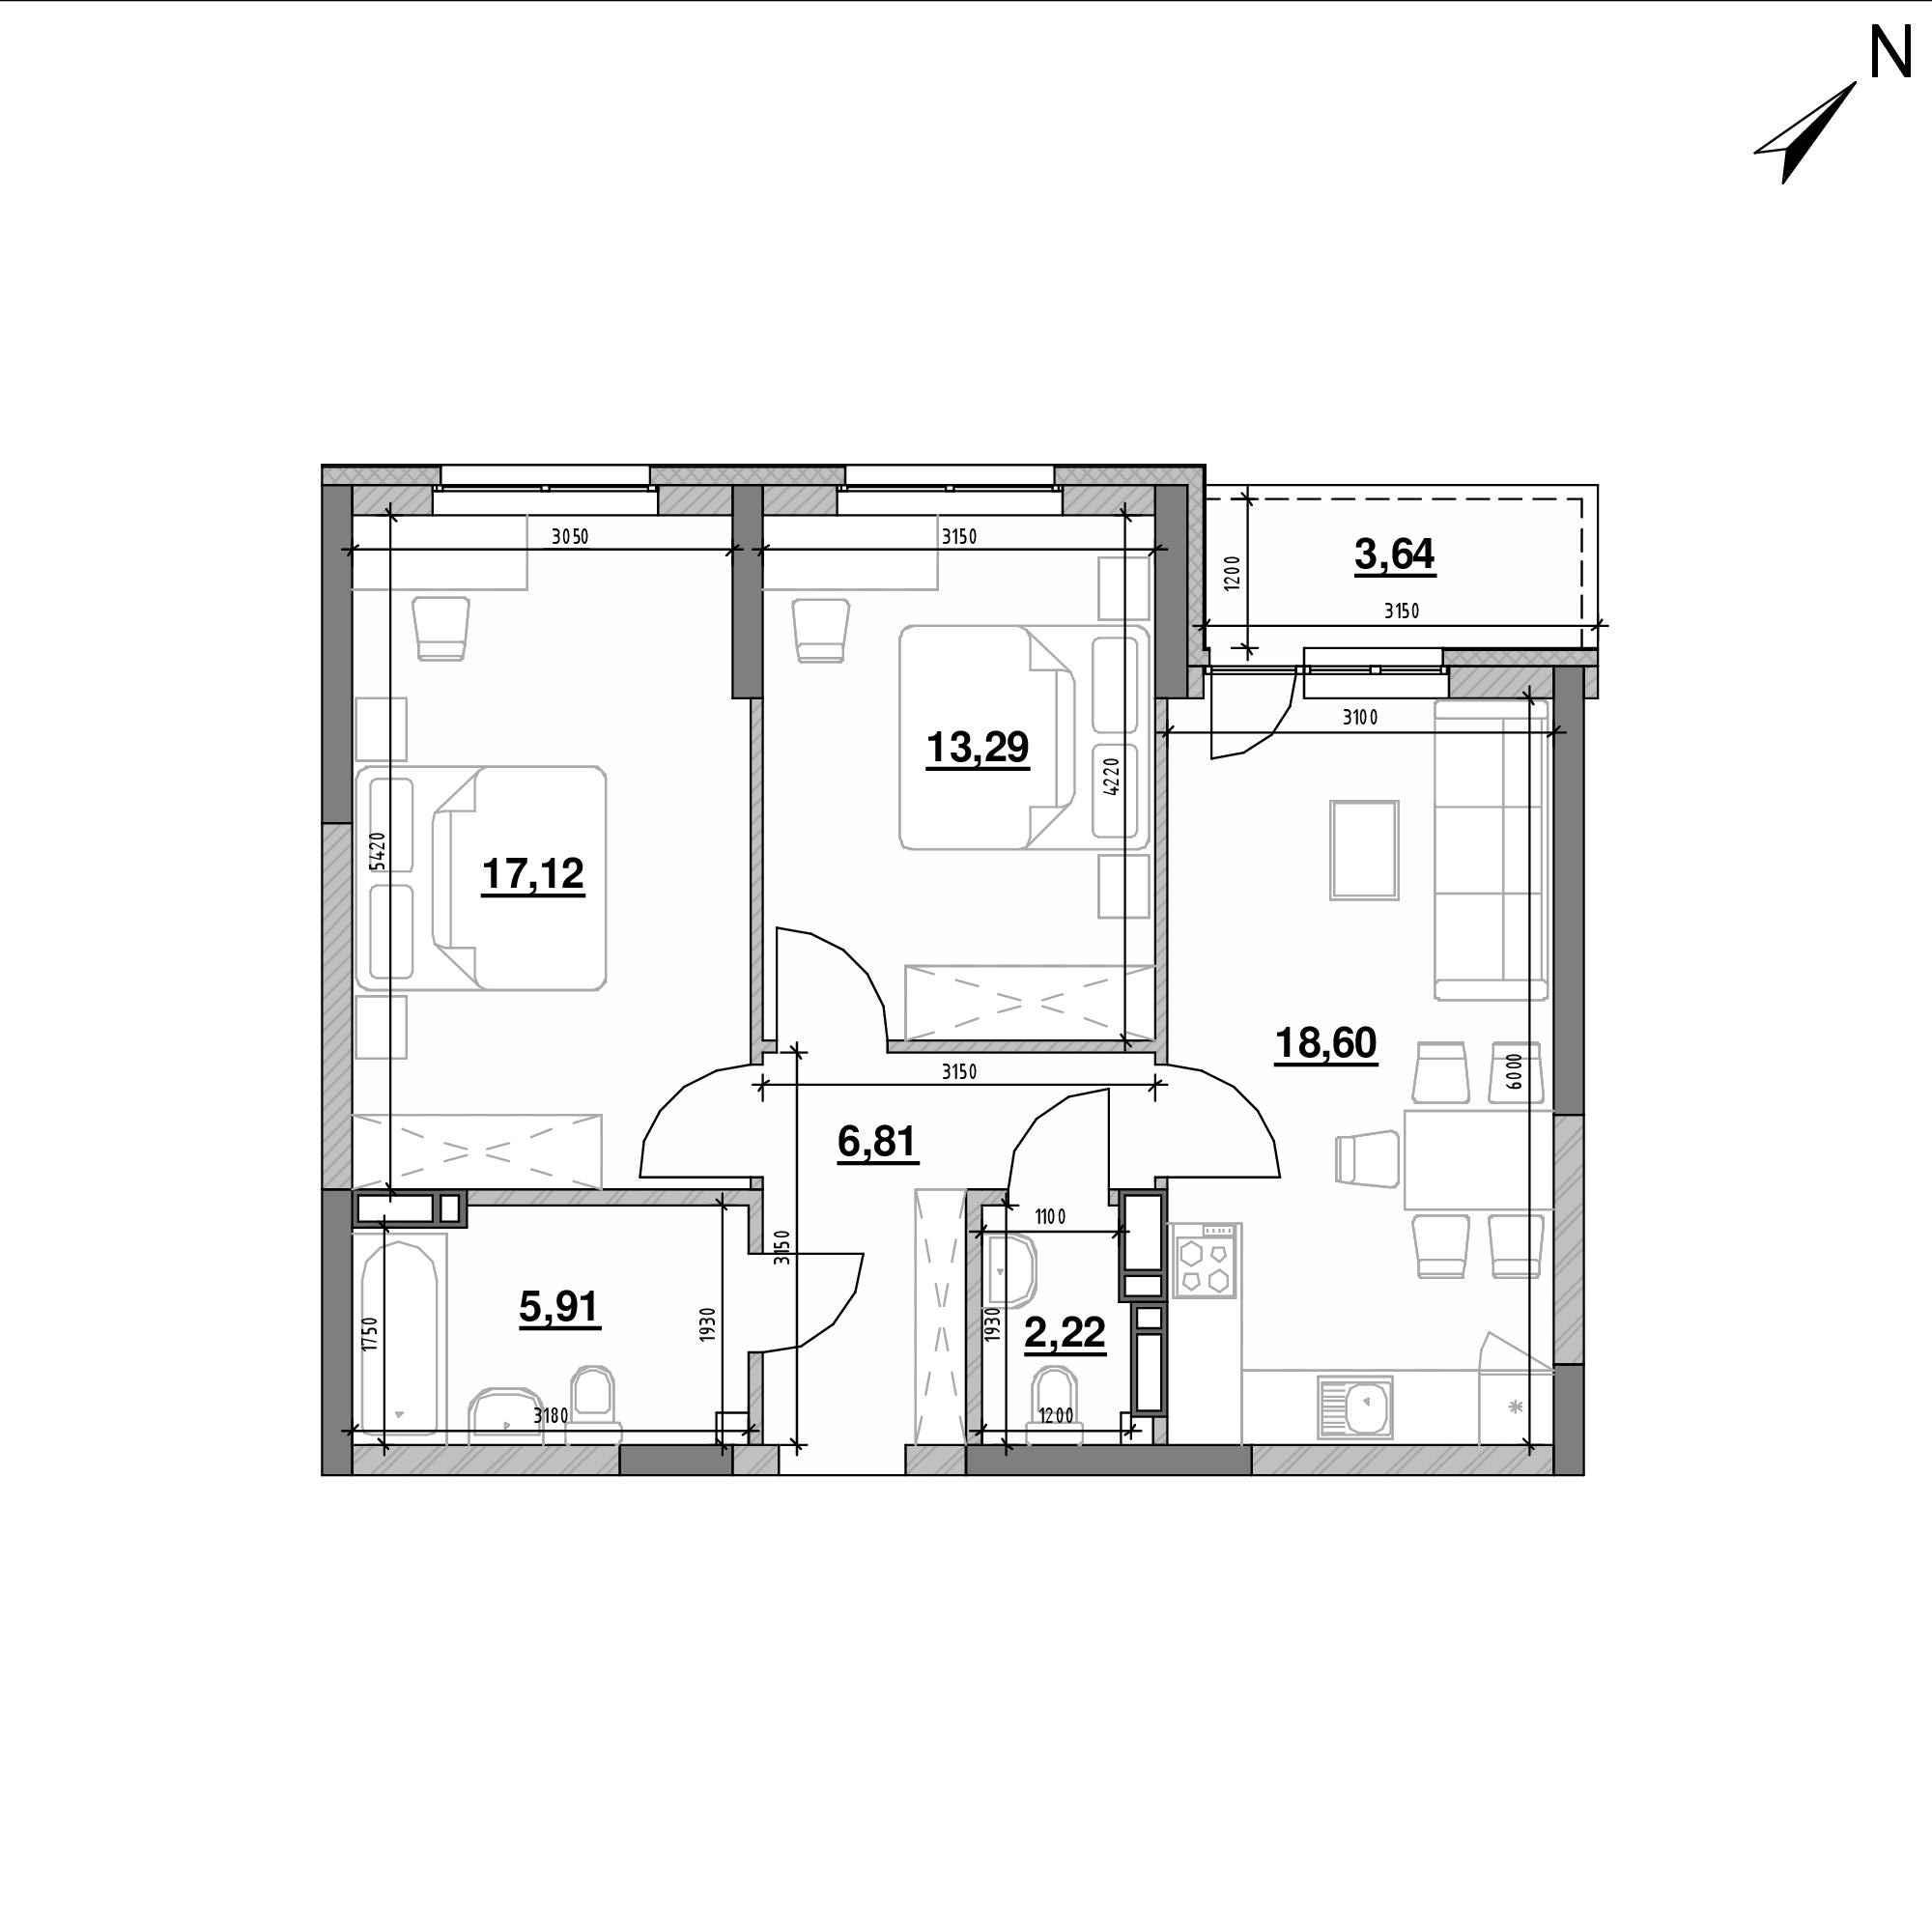 ЖК Оk'Land: планування 2-кімнатної квартири, №578, 67.59 м<sup>2</sup>